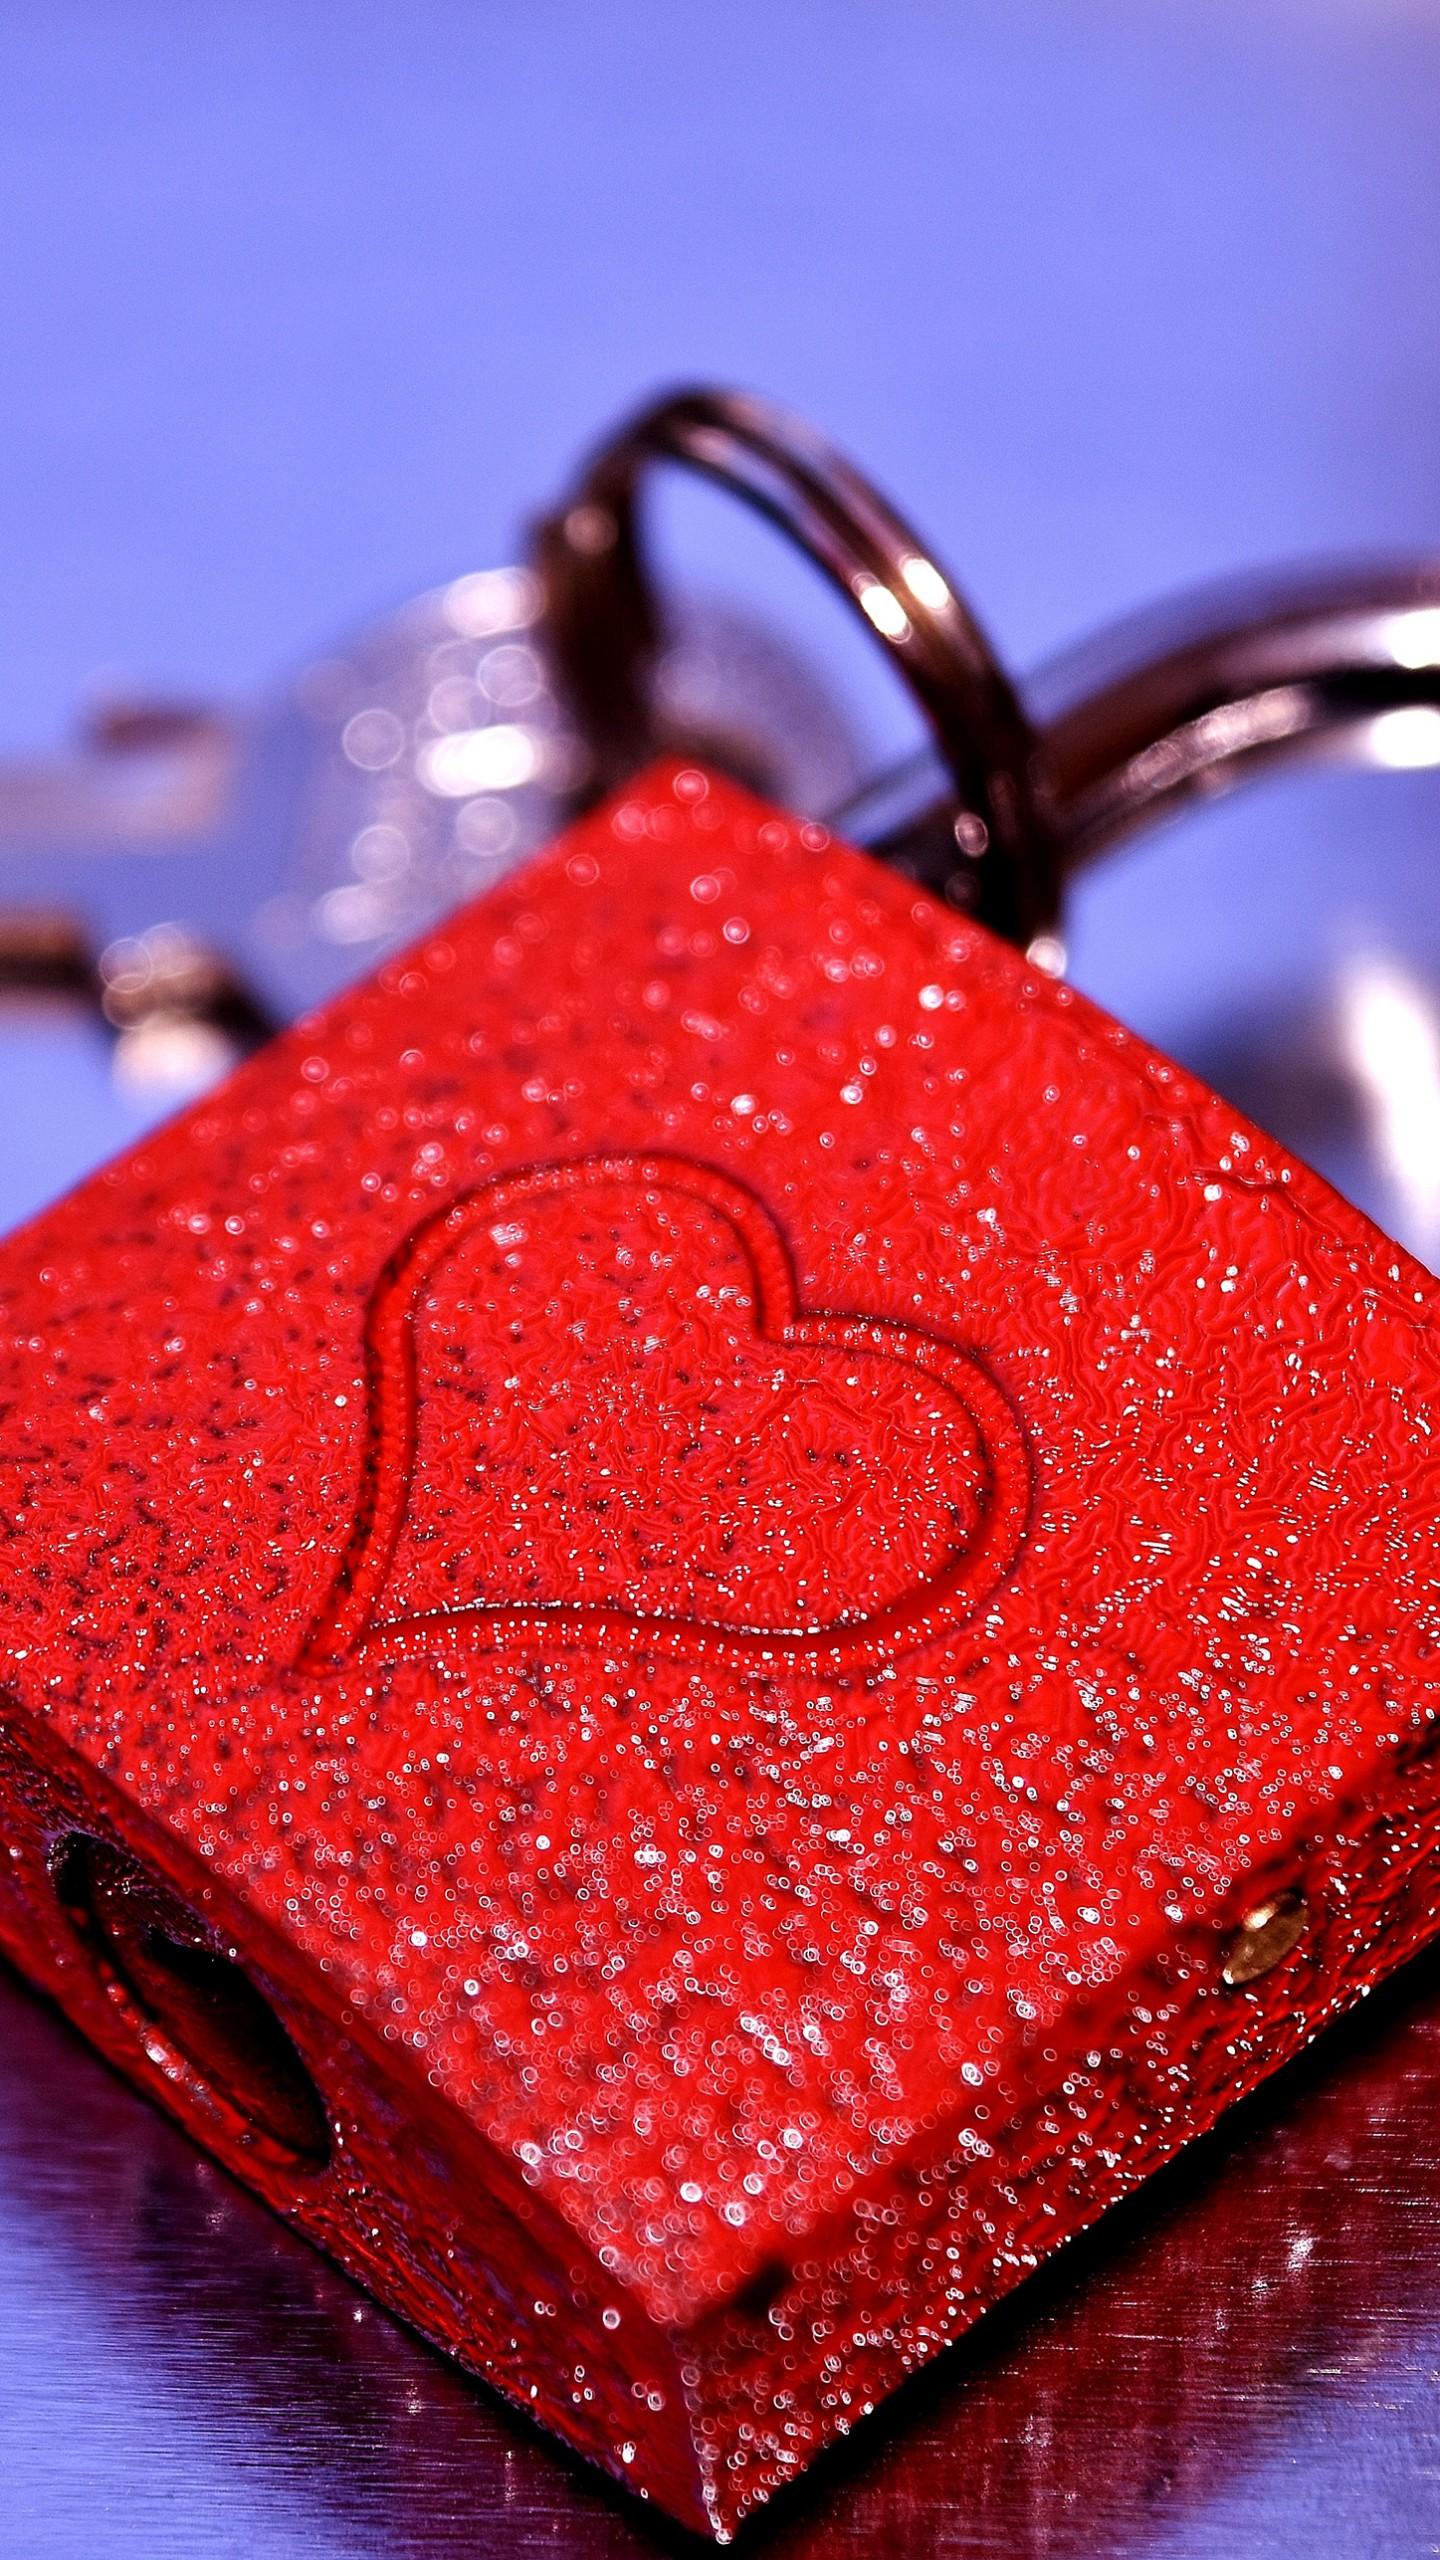 عکس زمینه قفل قرمز رنگ با تصویر قلب پس زمینه